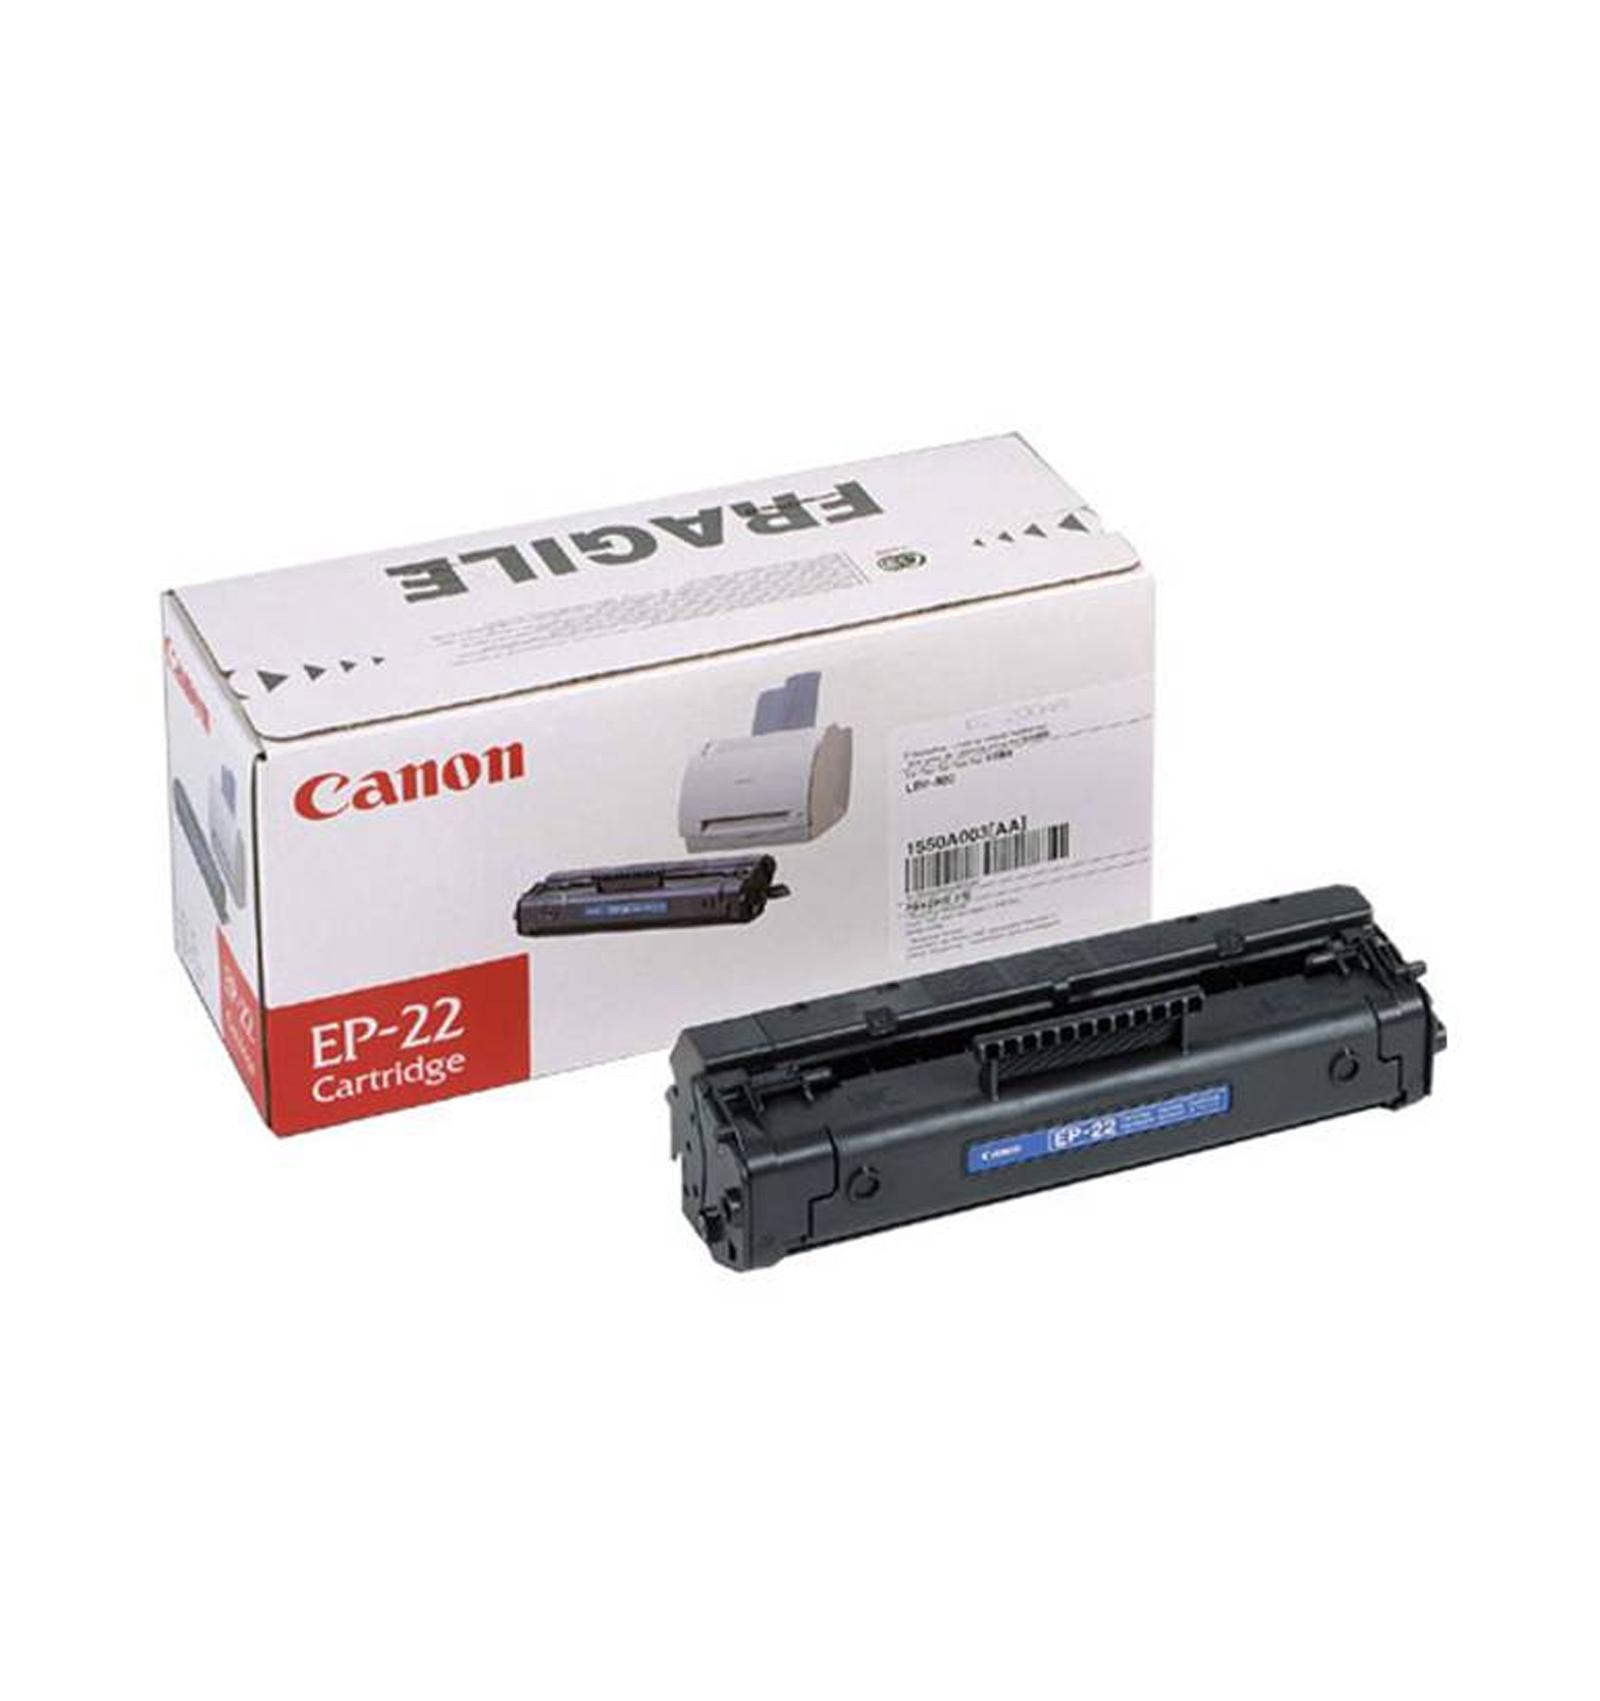 Canon EP-22 для Laser Shot LBP-800/810/1120